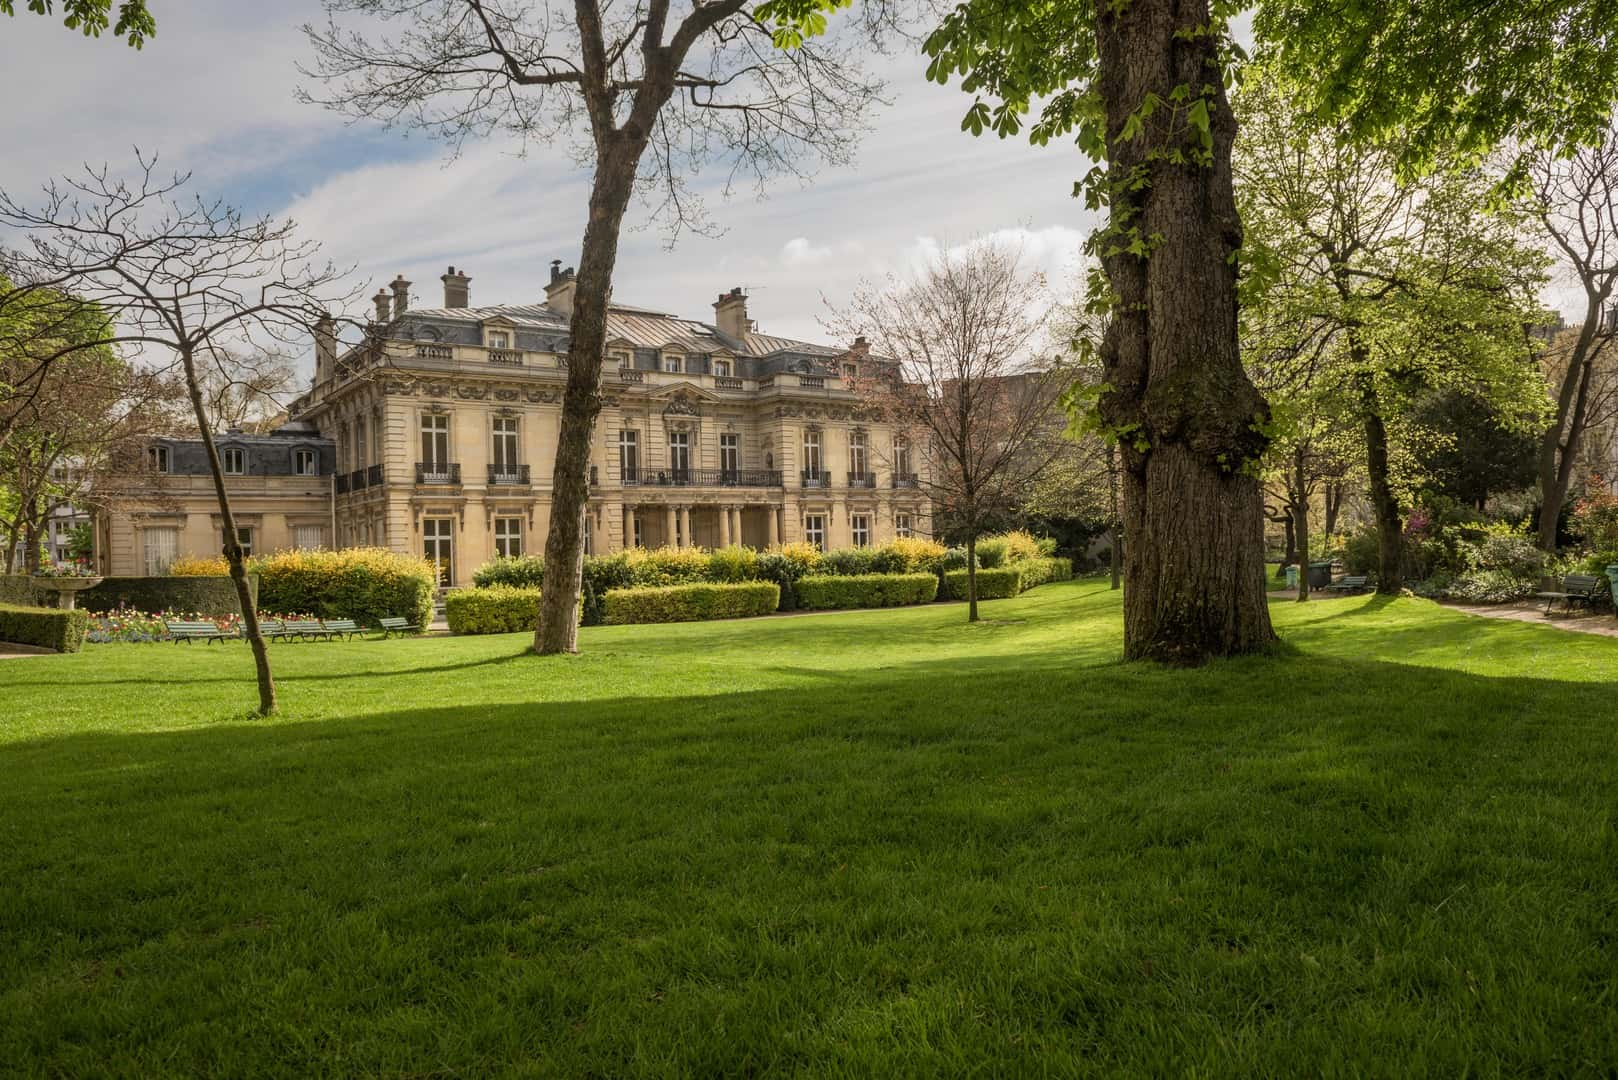 Jardin de l'Hôtel Salomon-de-Rothschild